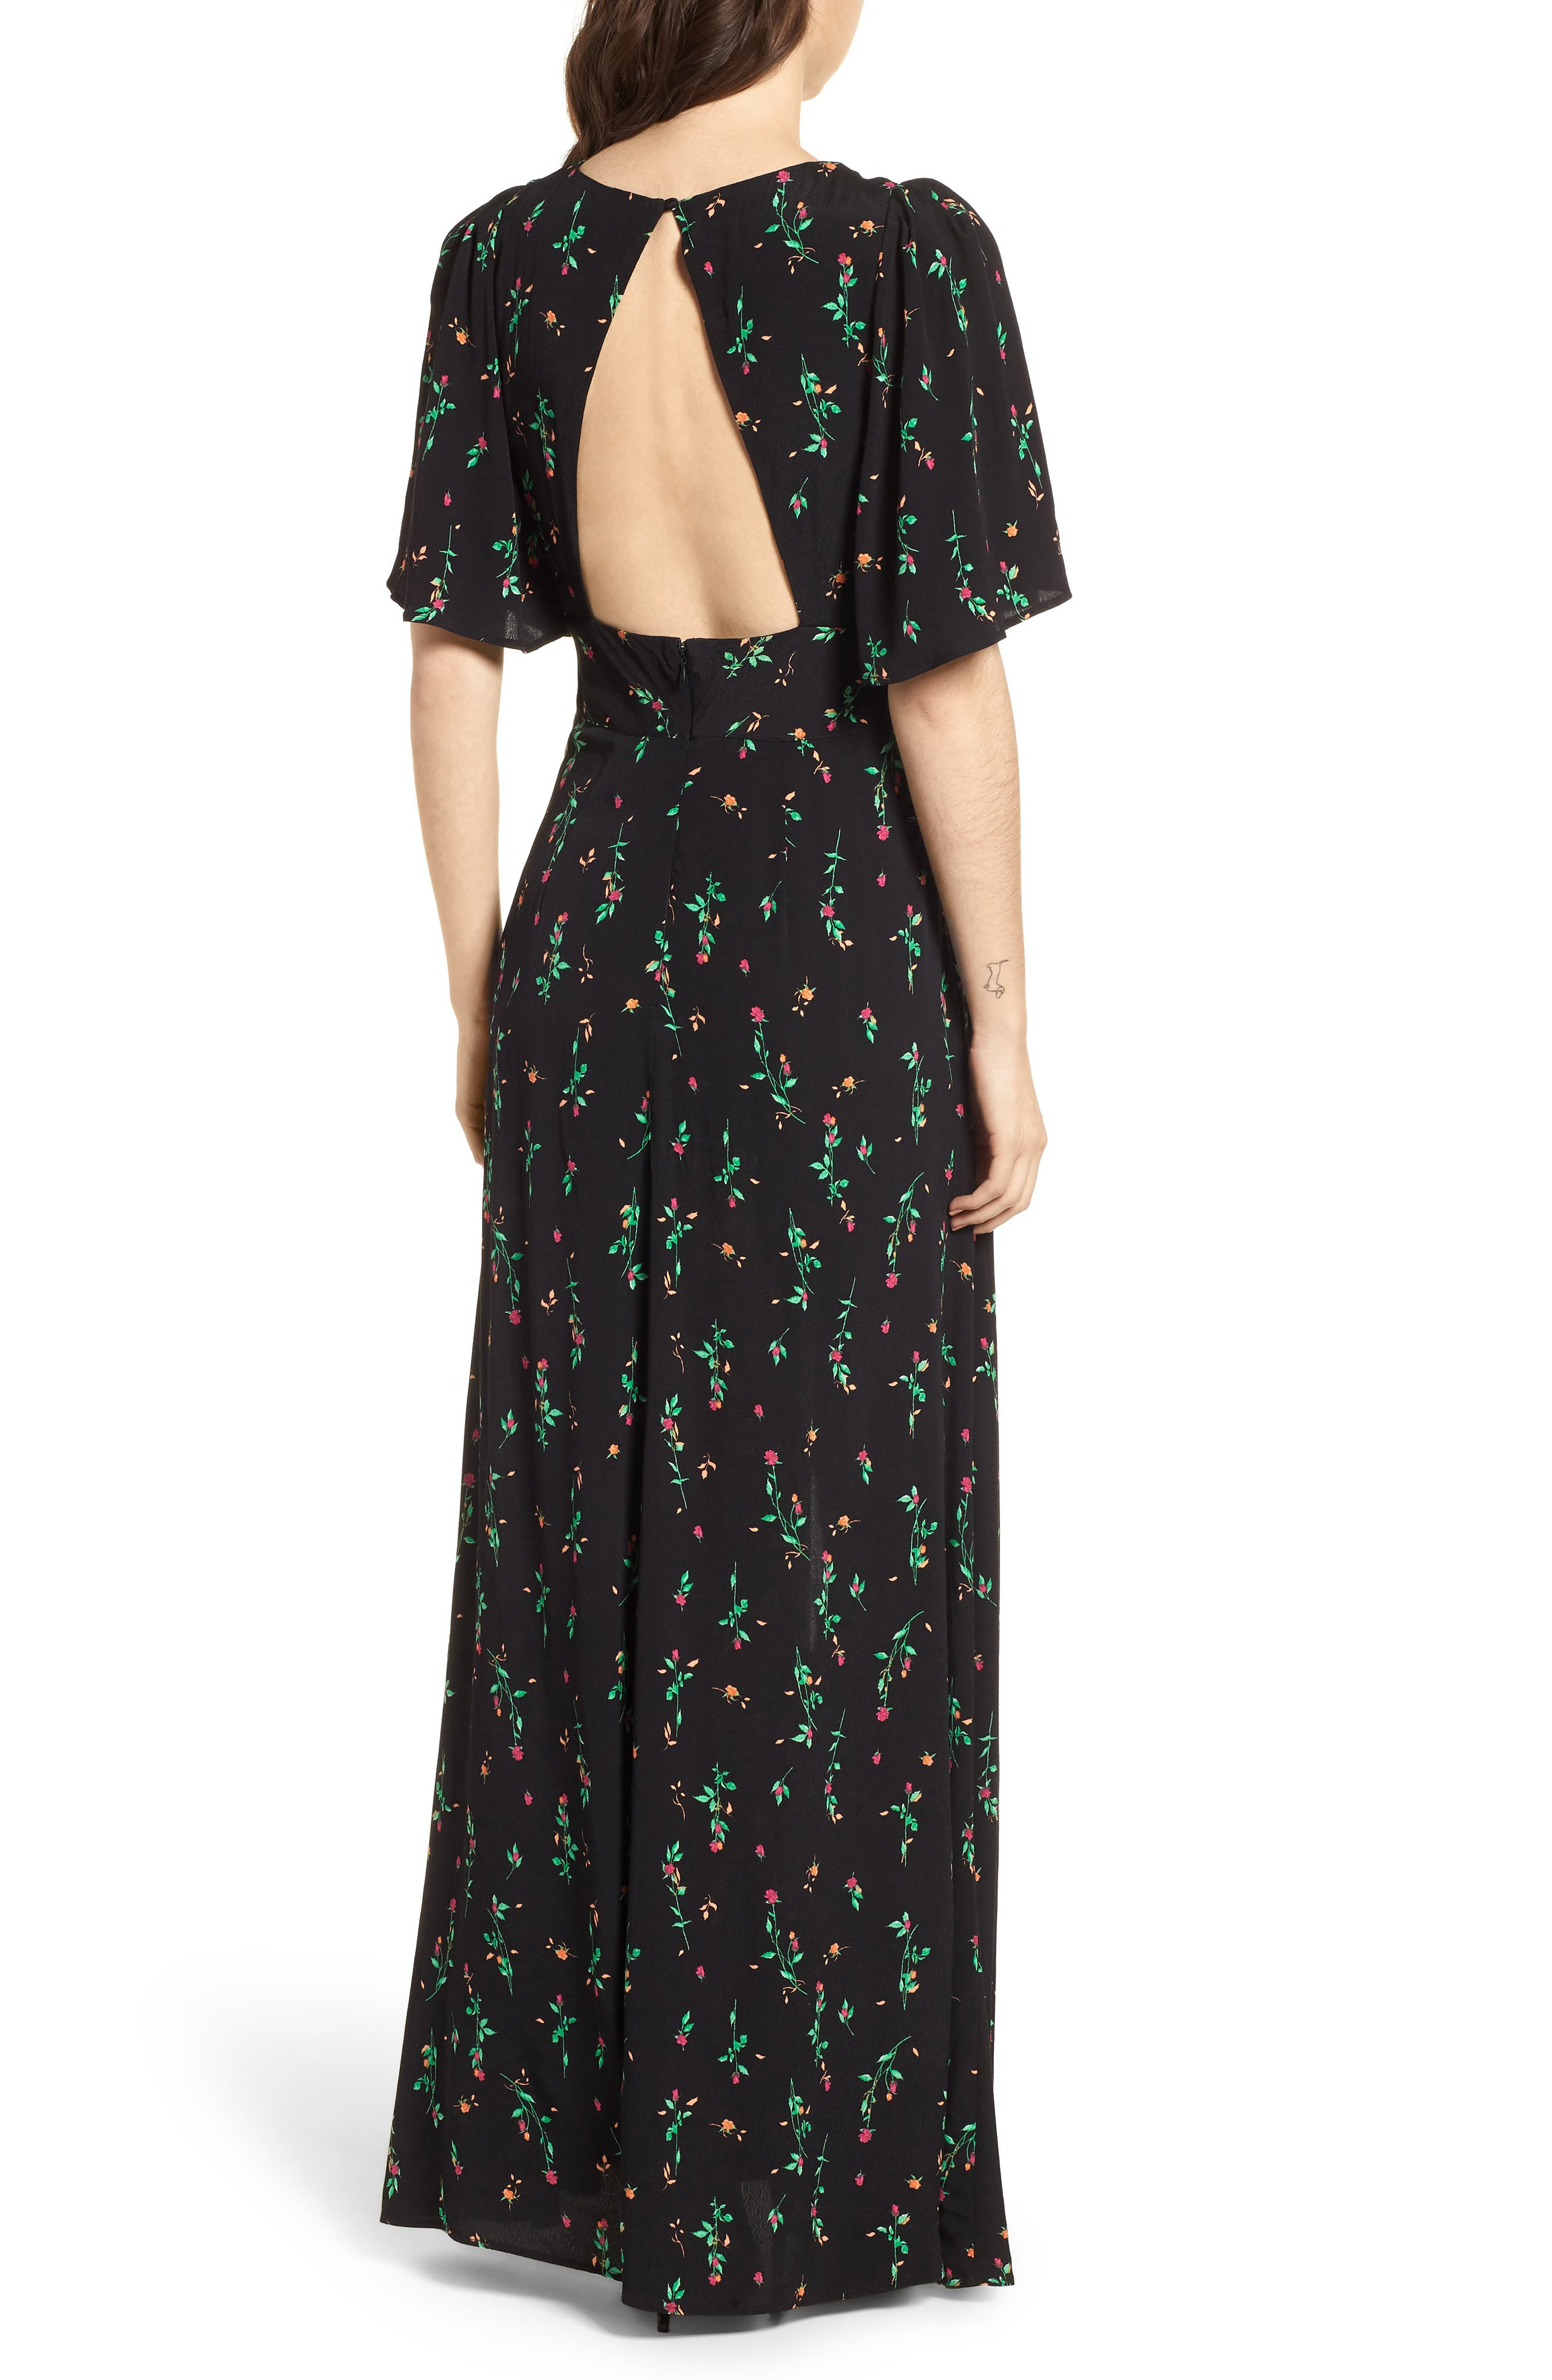 Ramon Tie Front Maxi Dress,                             Alternate thumbnail 2, color,                             Noir Rose Ditsy